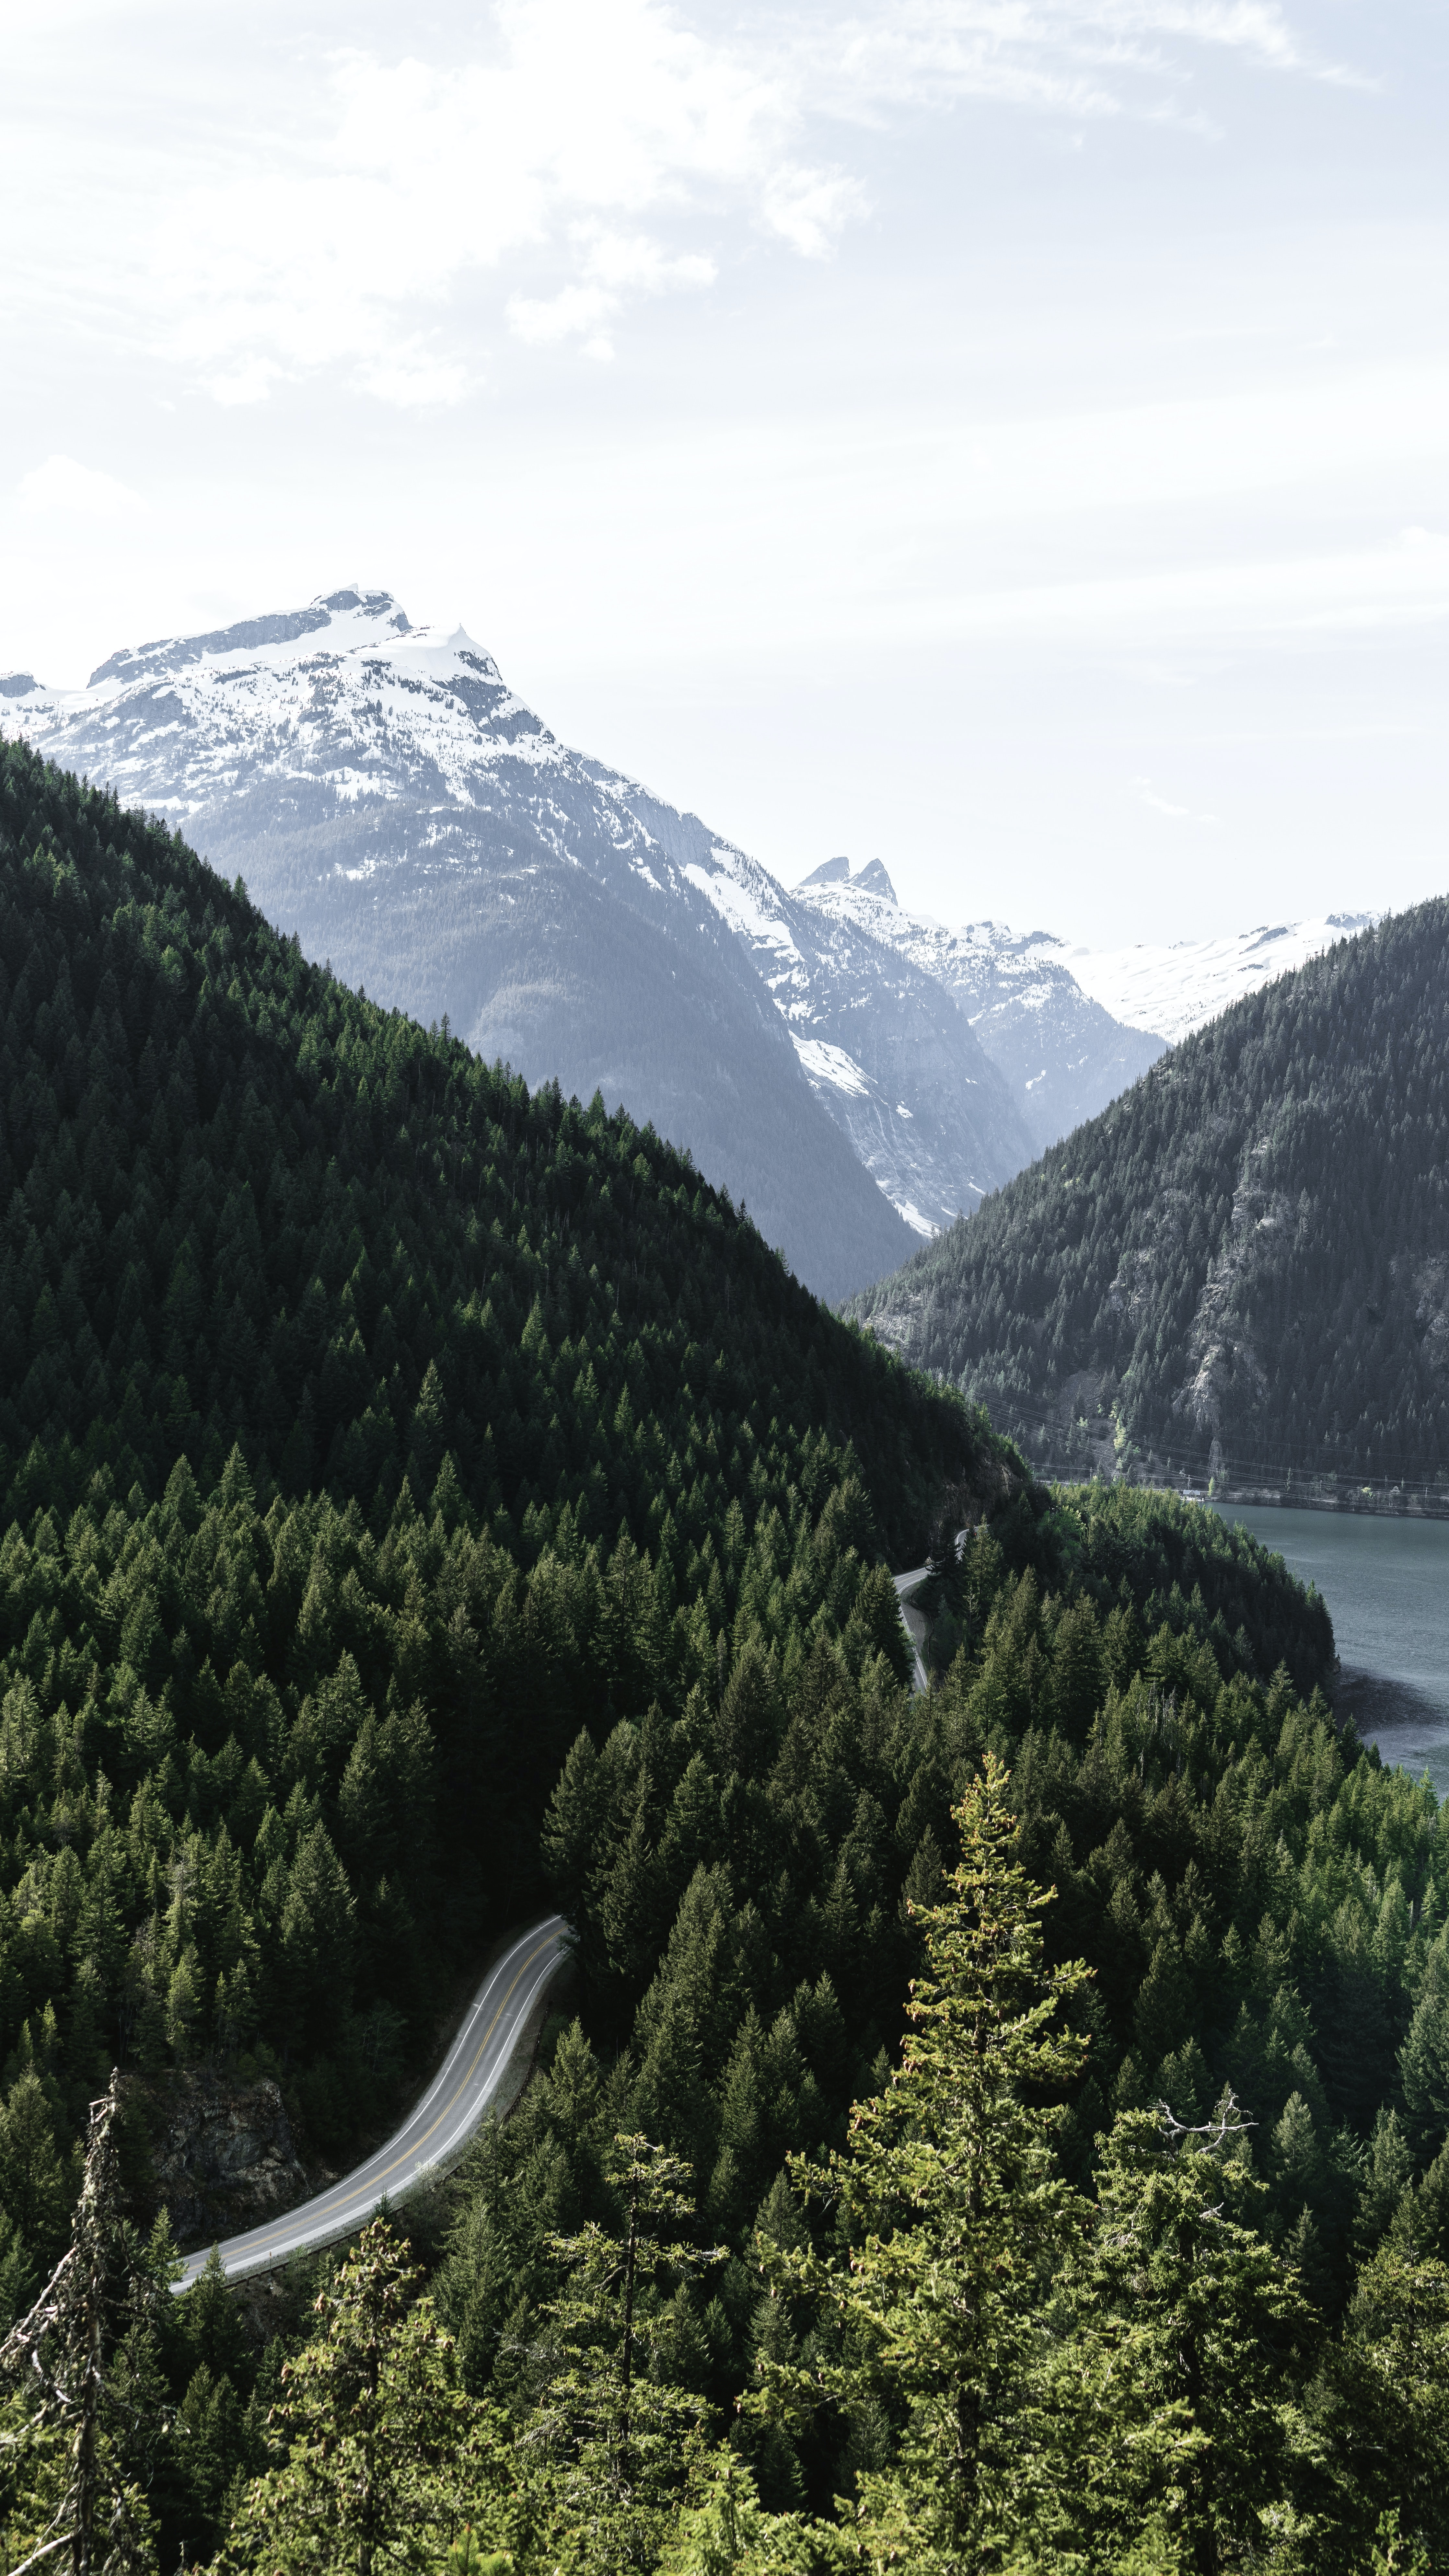 asphalt road between trees near mountain